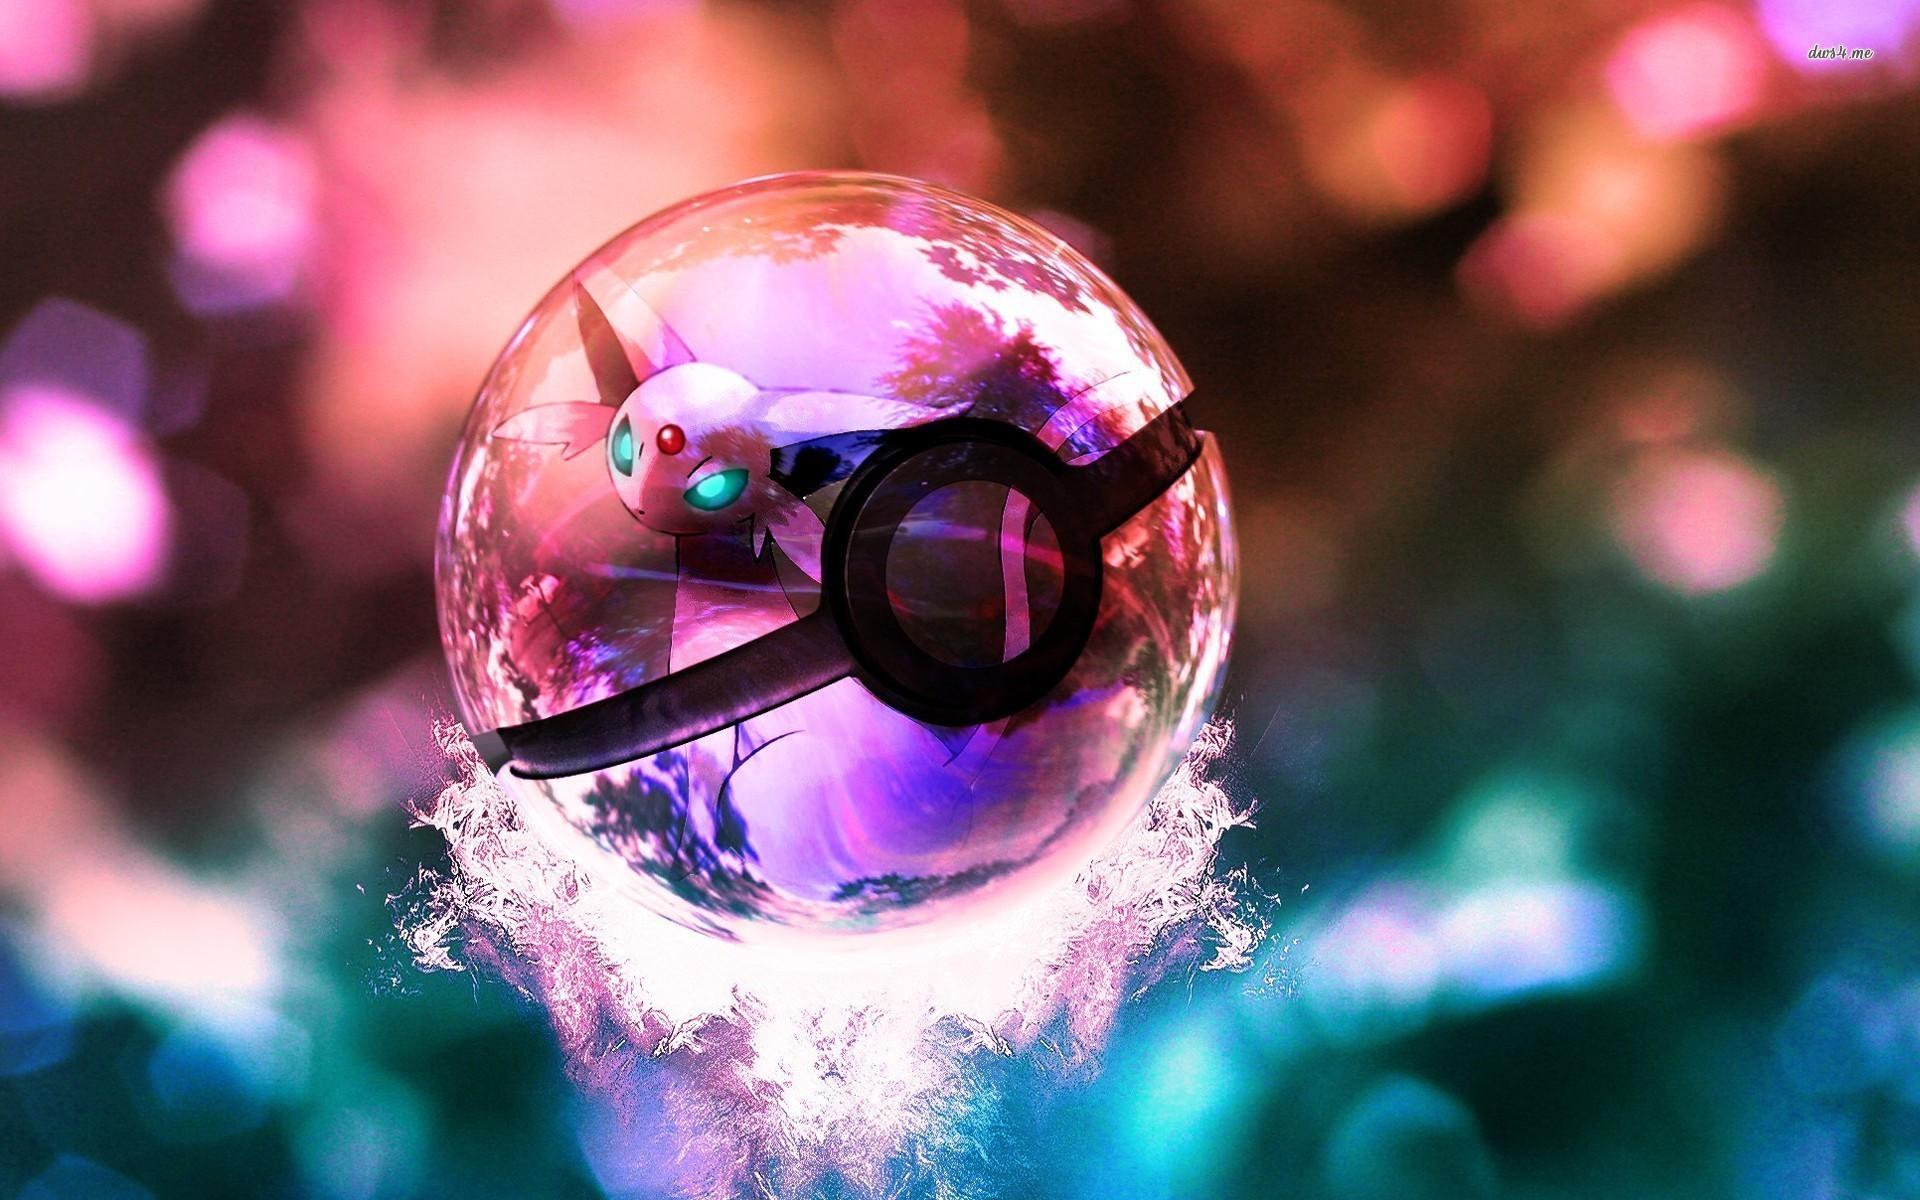 Pokeball Pokemon Anime Wallpaper HD